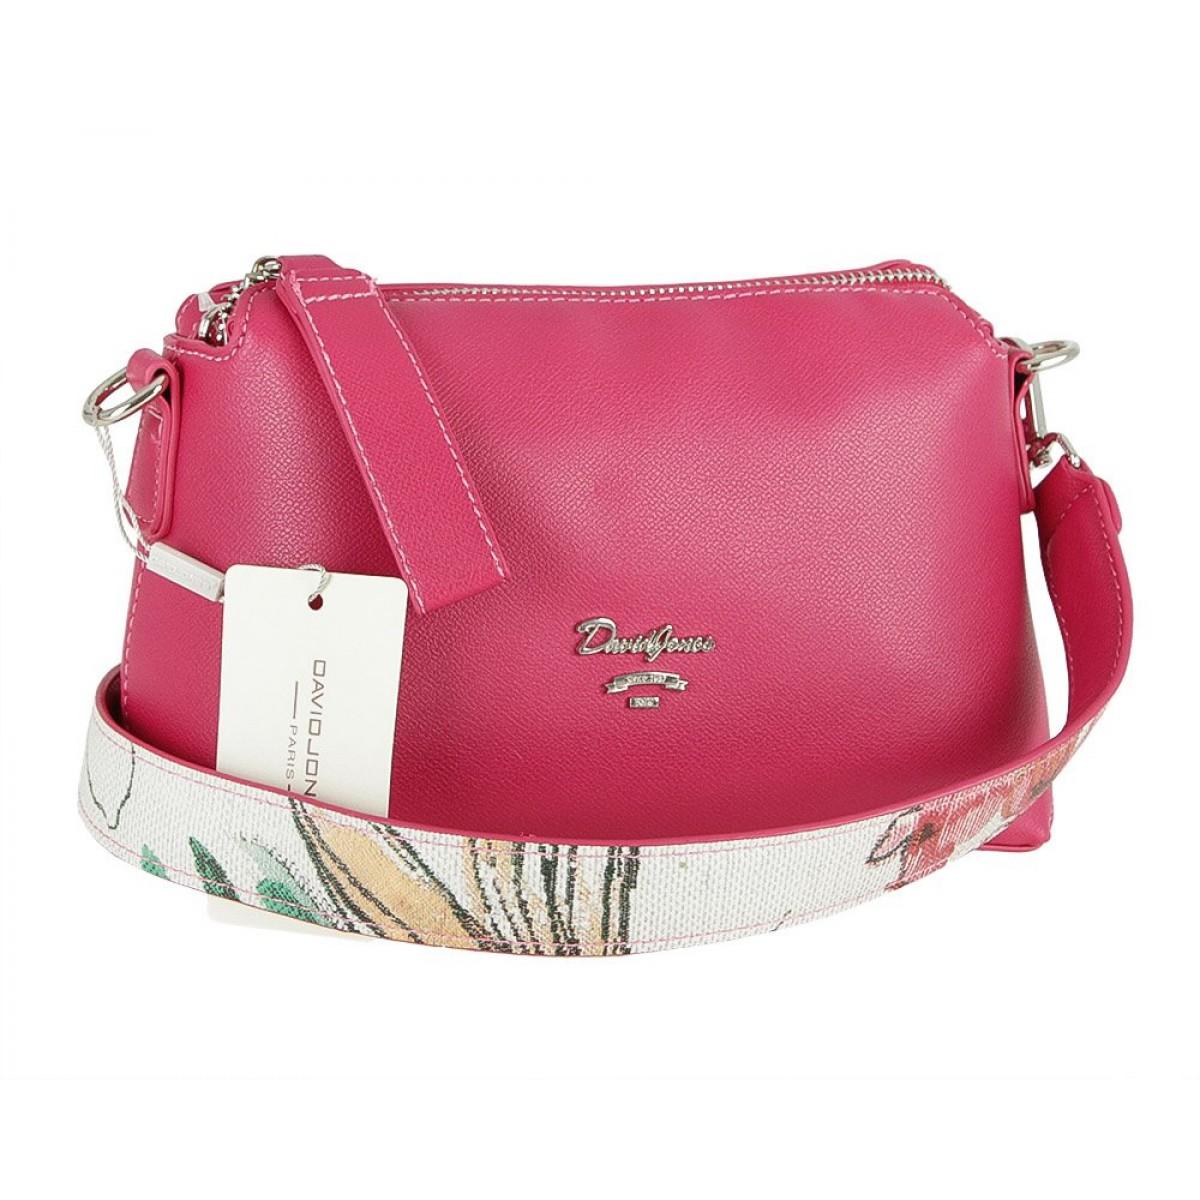 Жіноча сумка David Jones 5912-1 ROSE RED